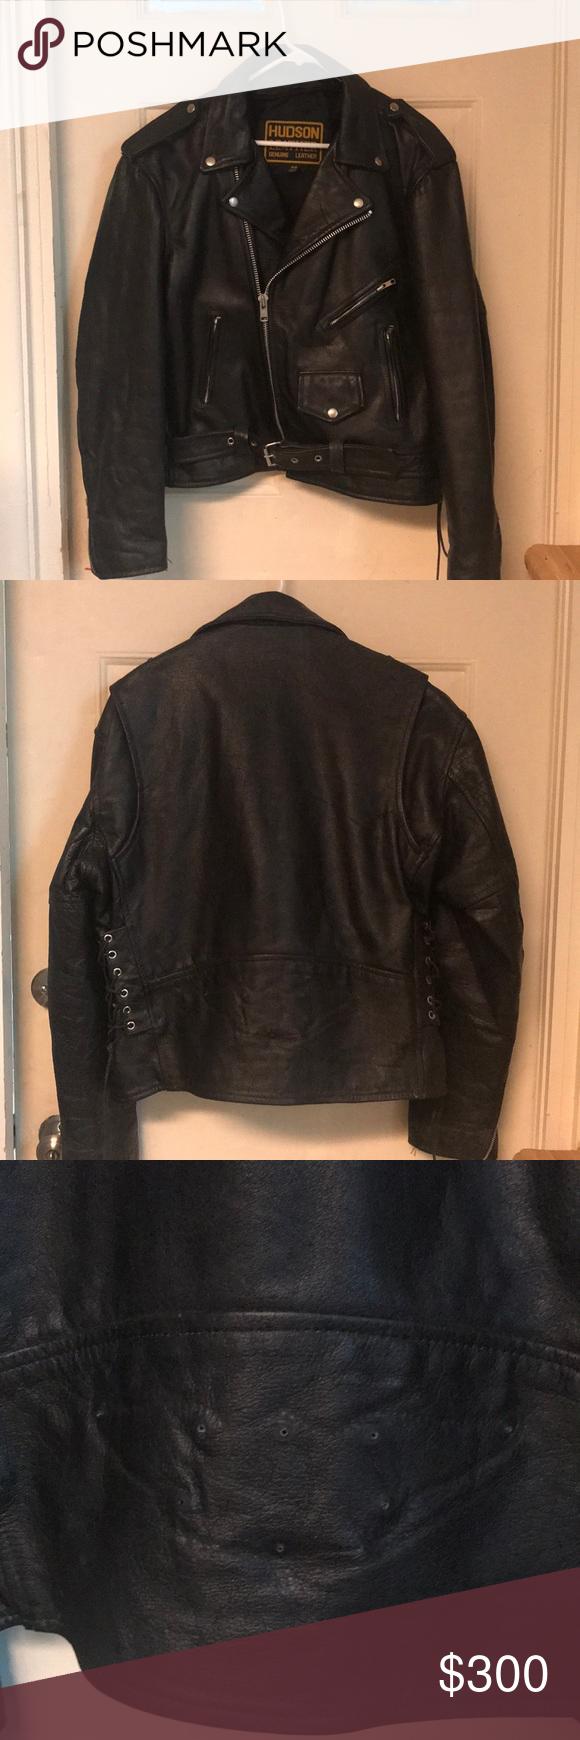 Genuine Leather Jacket Men S Size 44 Genuine Leather Jackets Jackets Leather Jacket [ 1740 x 580 Pixel ]